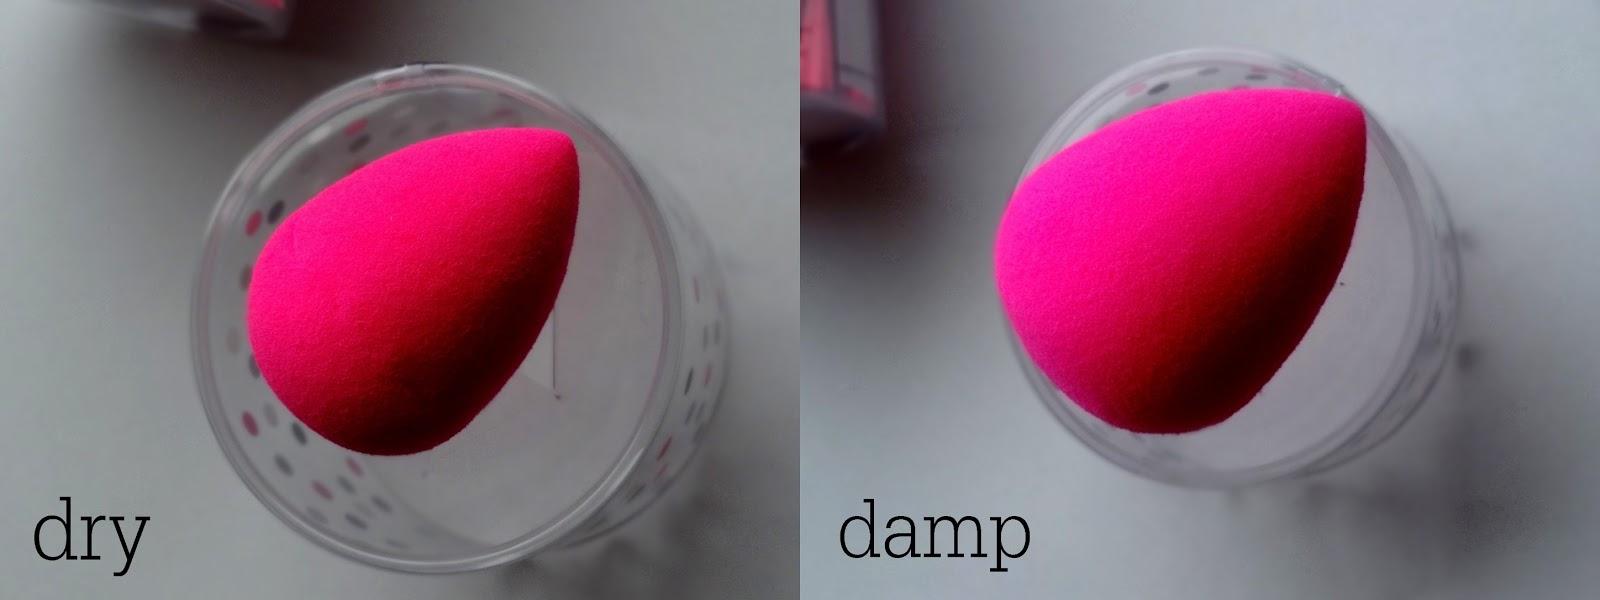 Makeup Beauty And More The Beautyblender Makeup Sponge